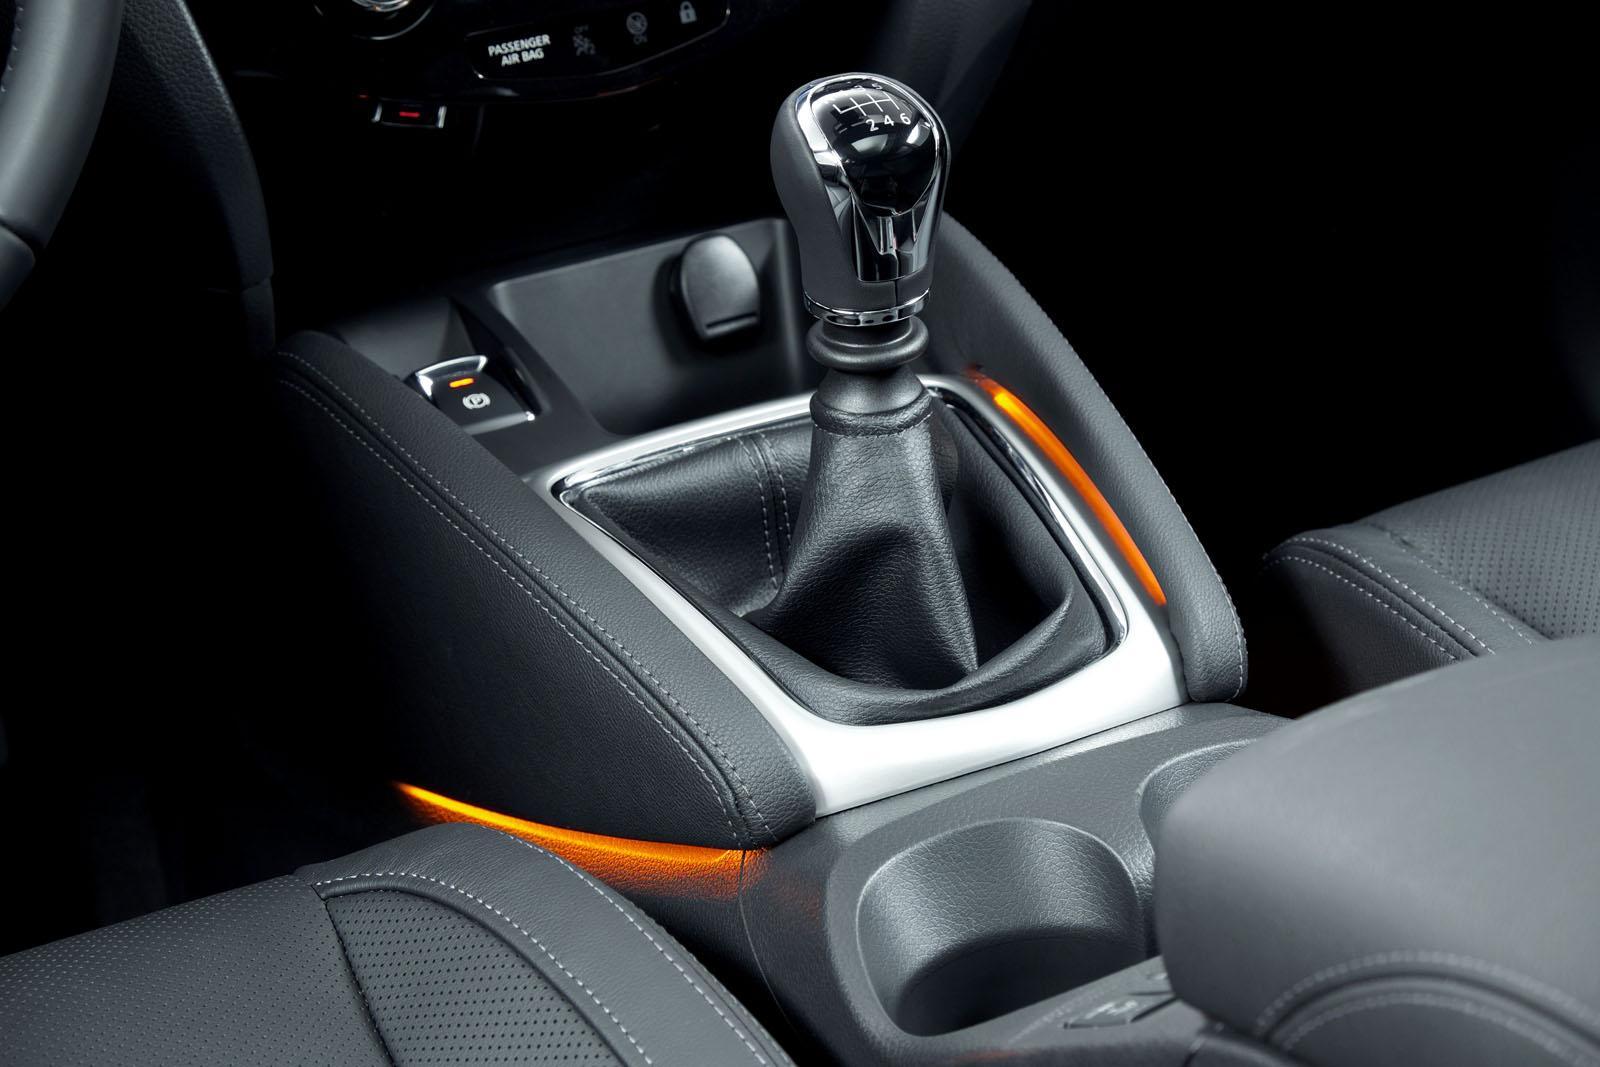 2014 nissan qashqai manual gear lever forcegt com rh forcegt com nissan qashqai manual transmission nissan qashqai manual review